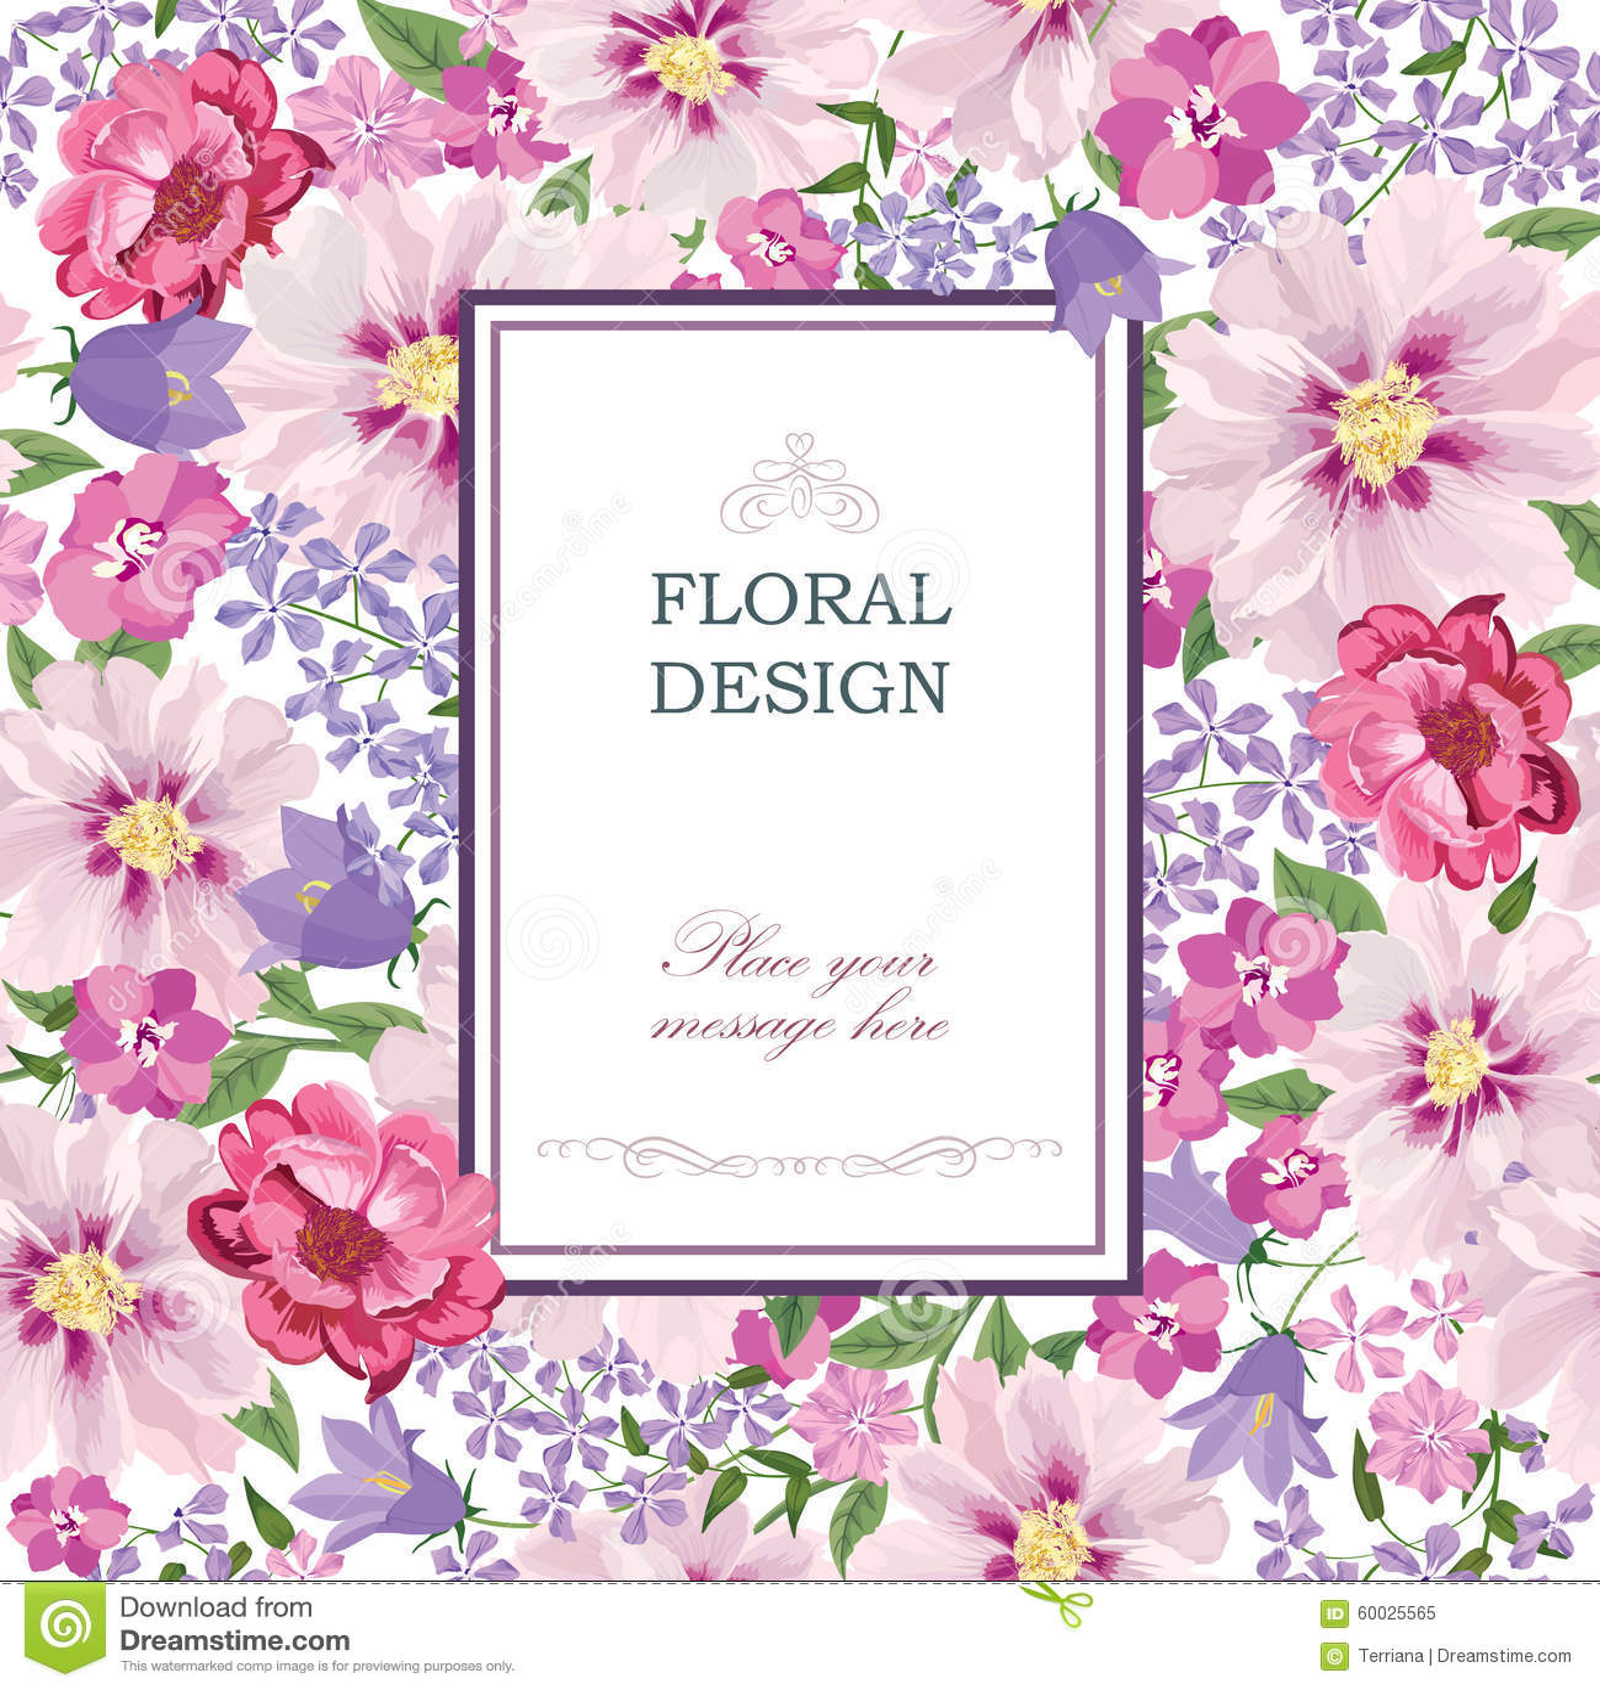 Floral background. Flower bouquet vintage cover. Flourish pattern wallpaper